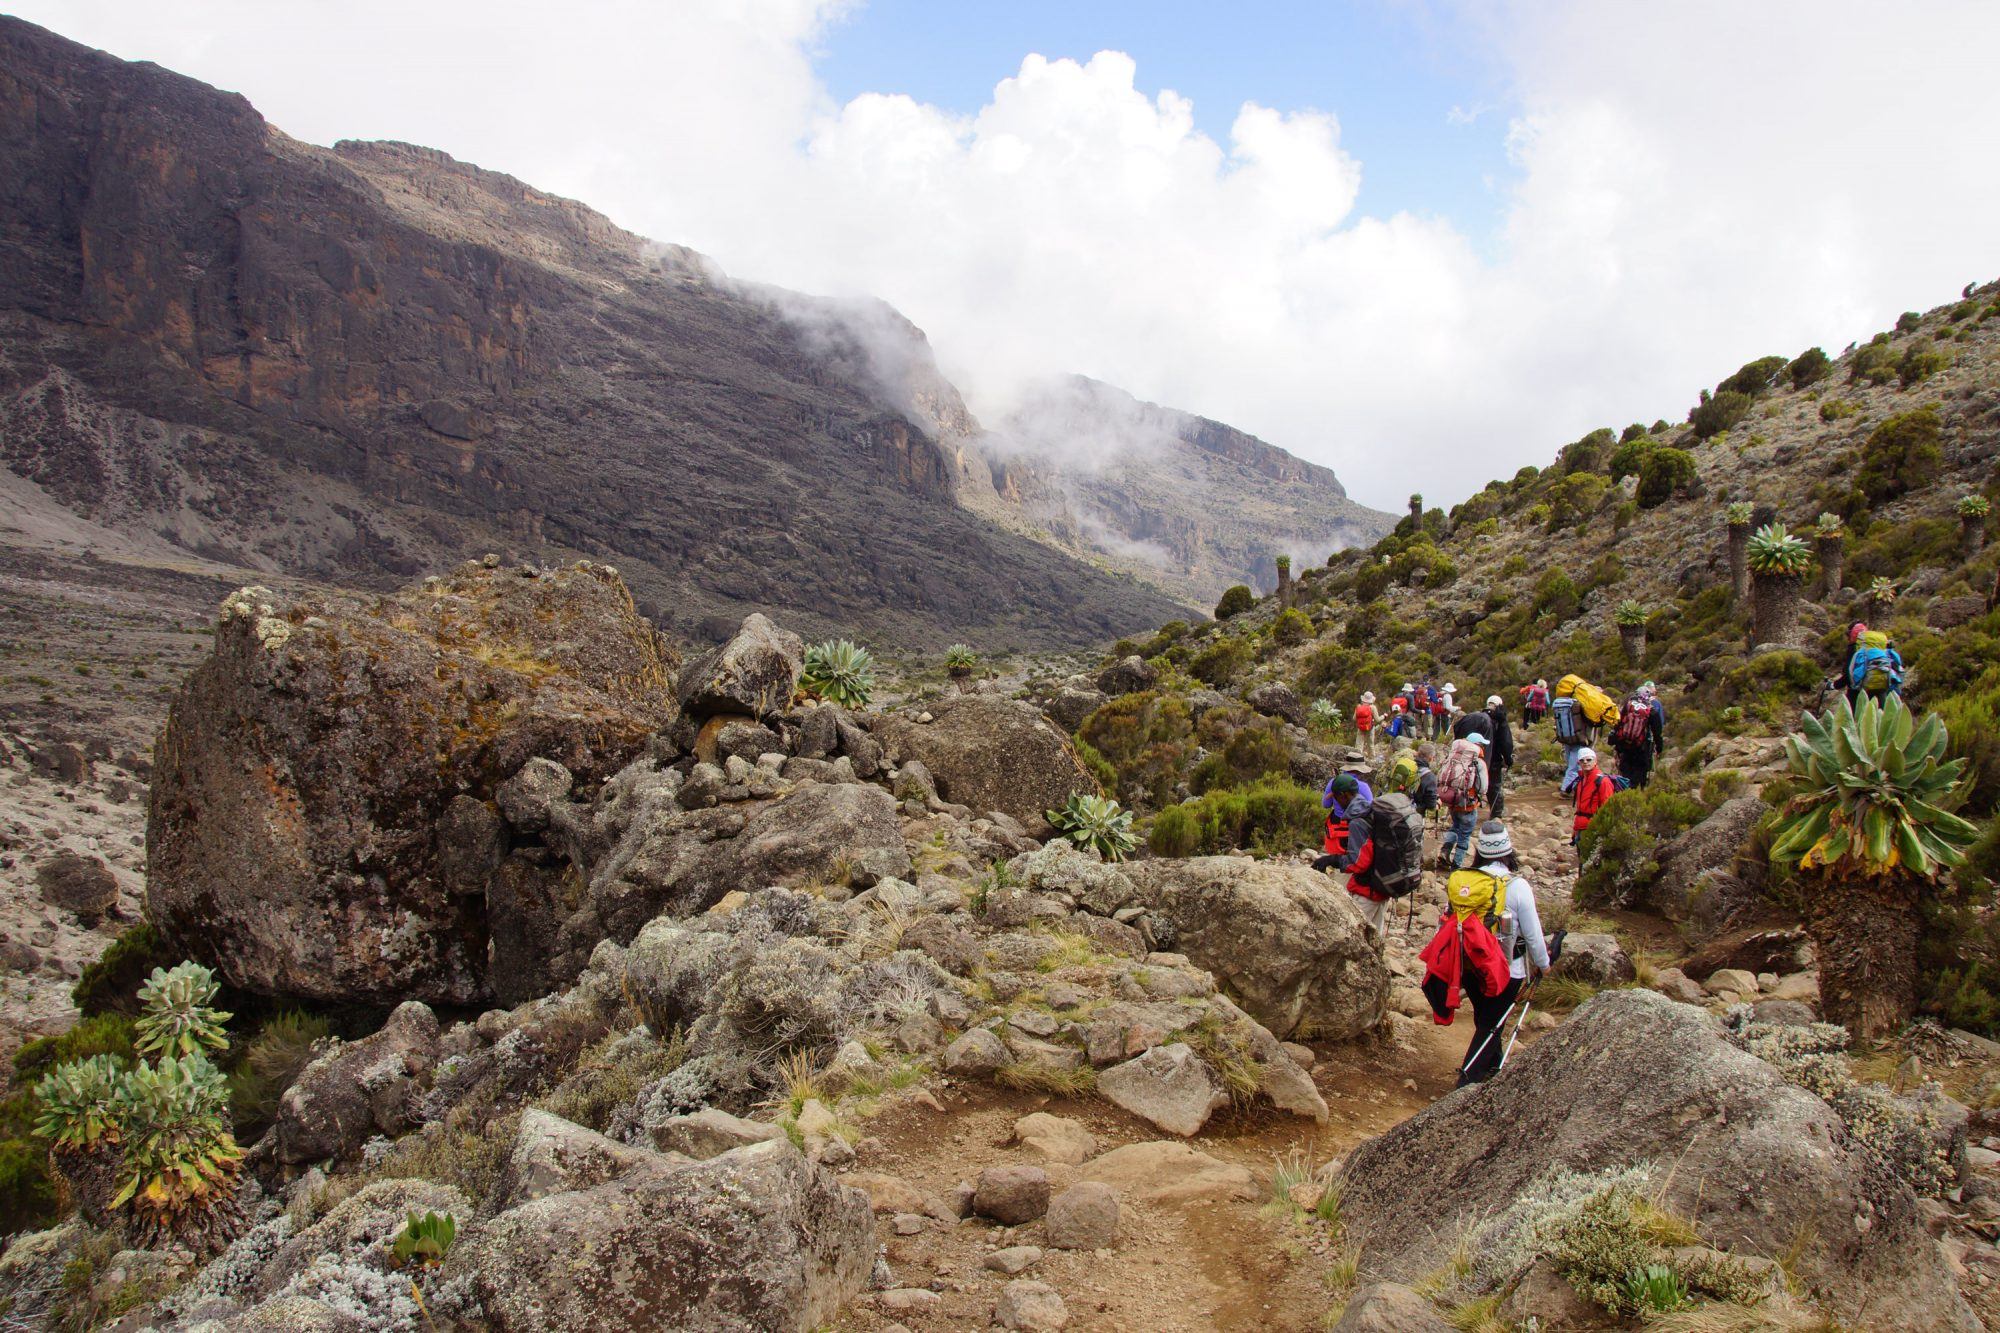 Senecien Kilimandscharo, Kilimandscharo besteigen, Tansania, Afrika, Kilimandscharo Tour, Erfahrungsbericht, Machame Route